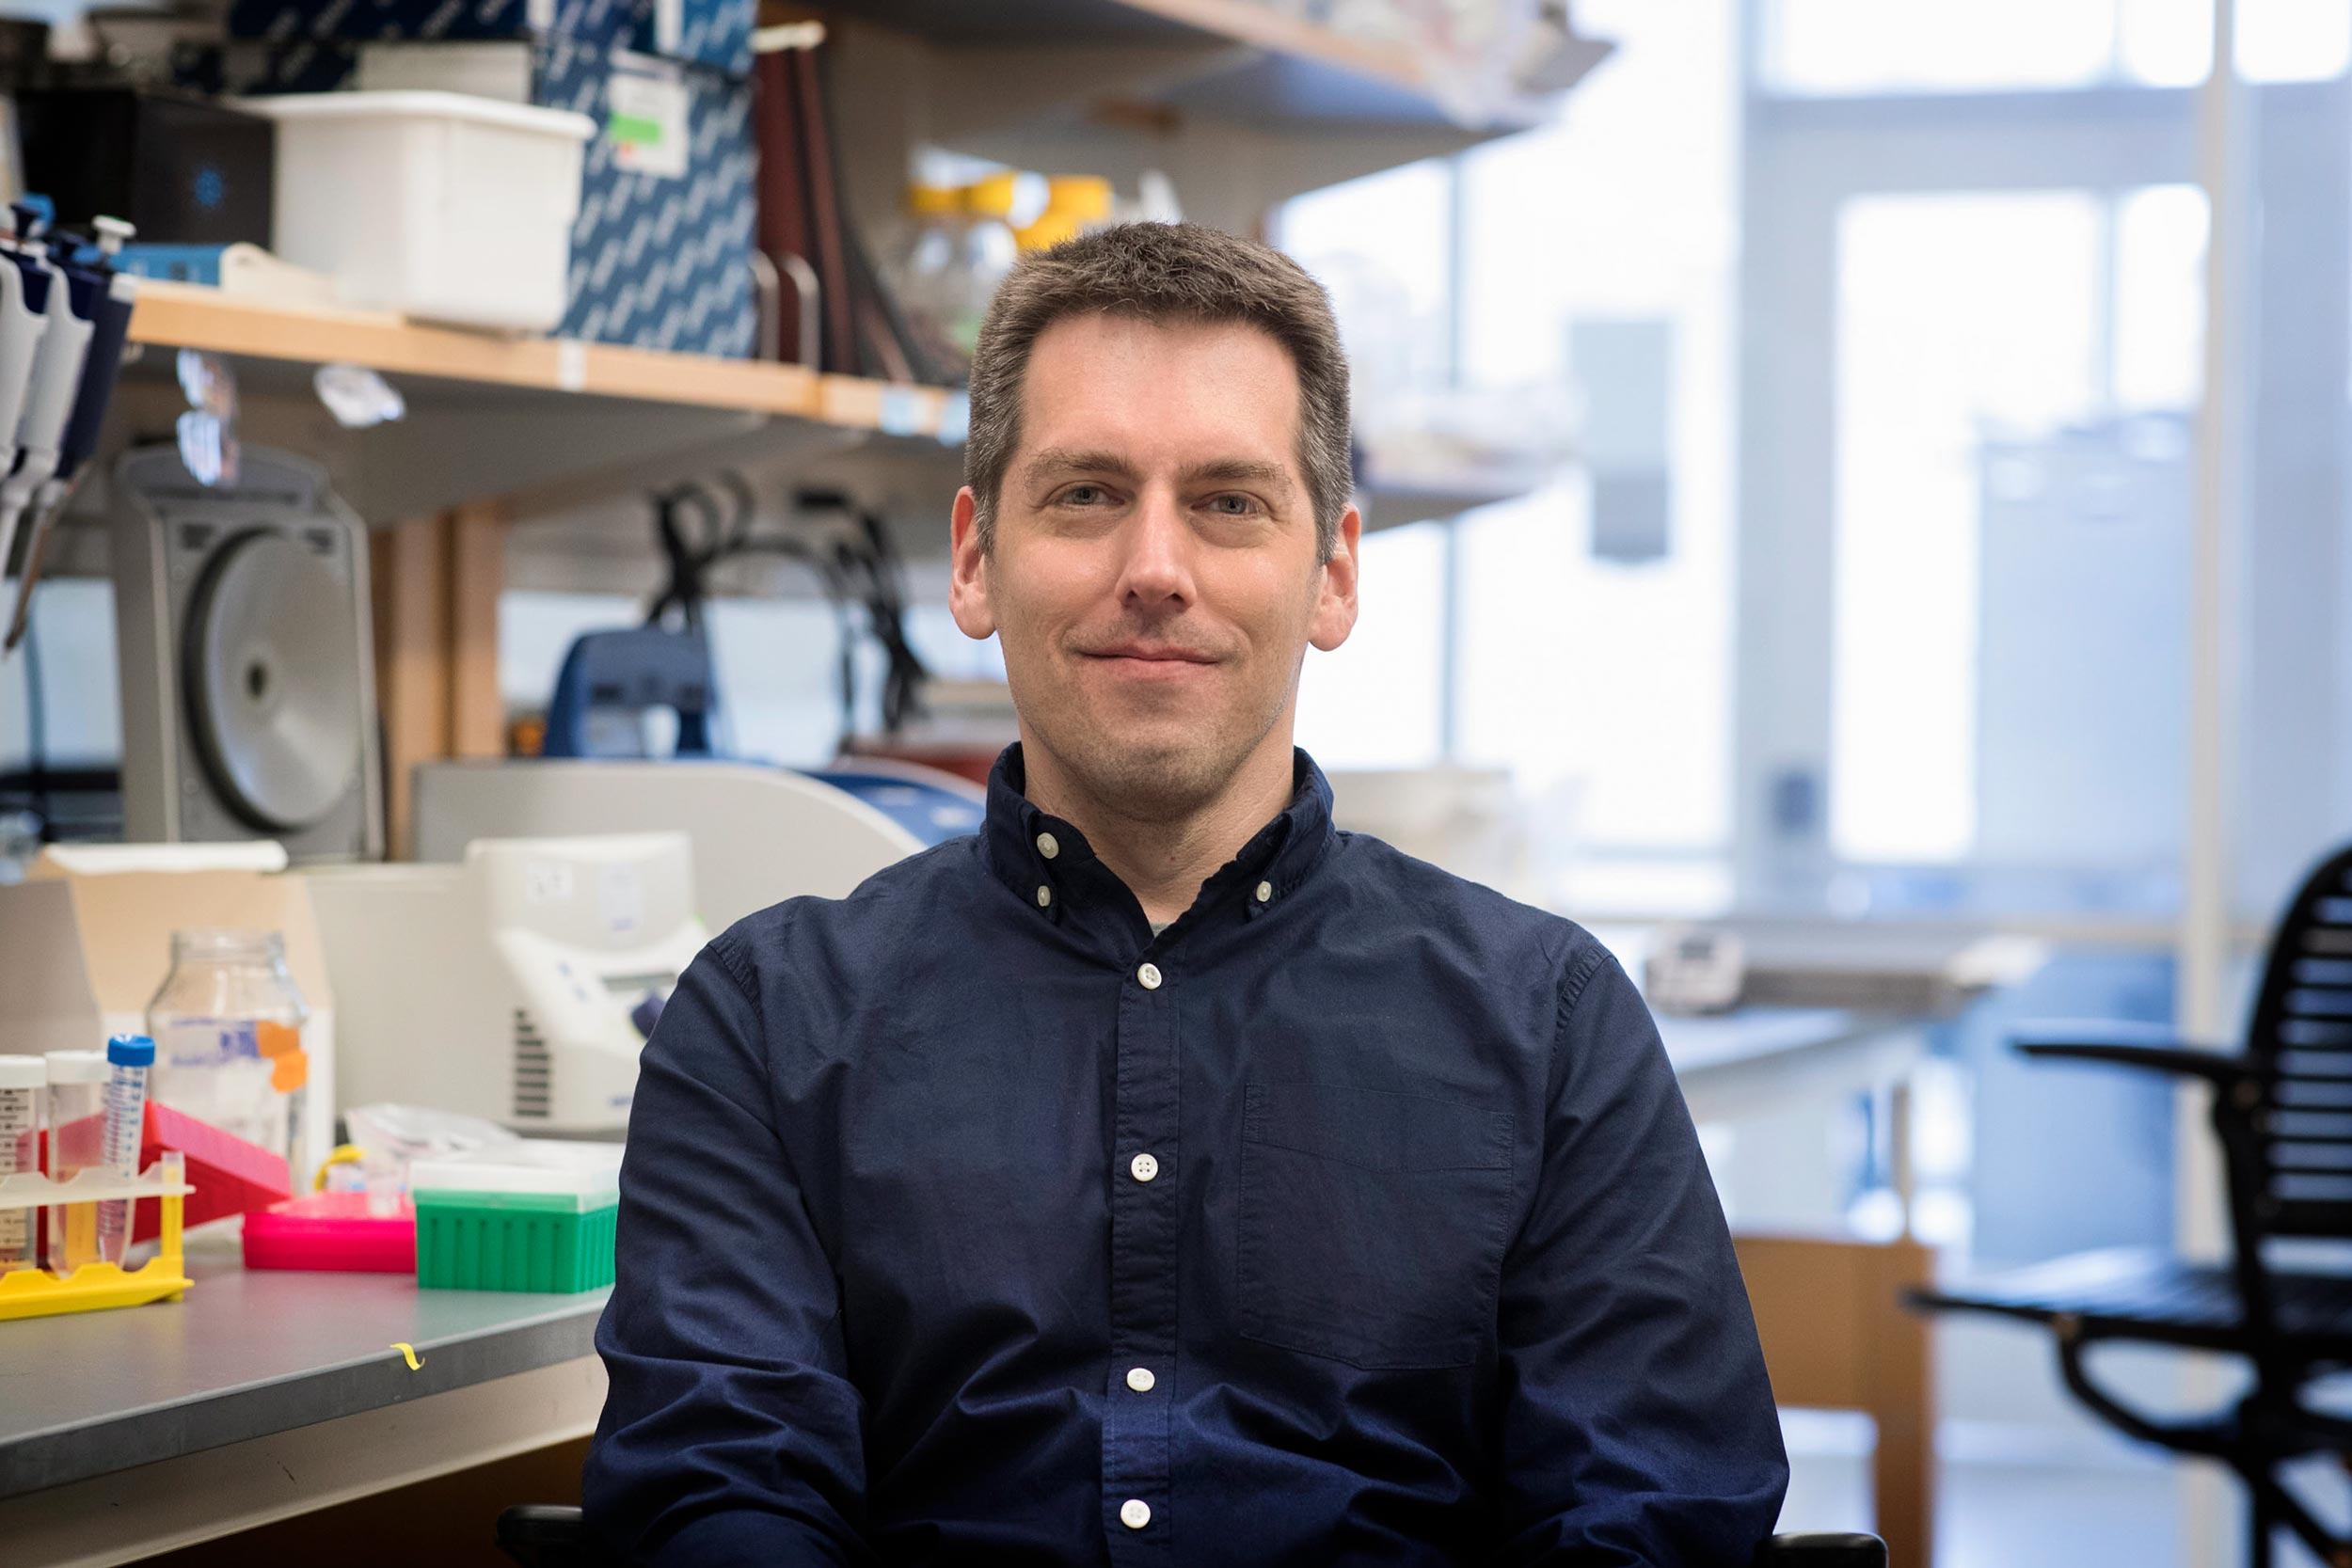 Study leader David Parichy, the Pratt-Ivy Foundation Distinguished Professor of Morphogenesis in UVA's Department of Biology.